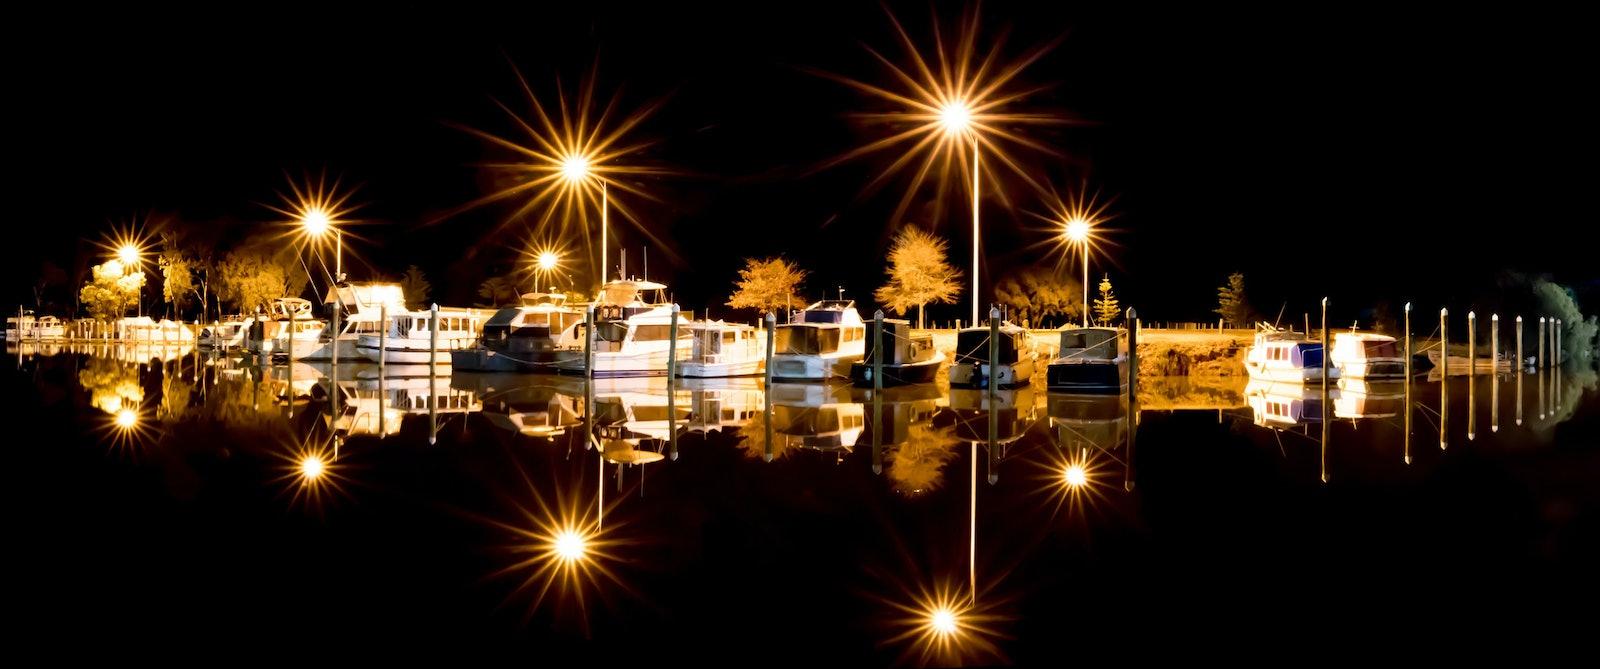 IMG_2481-Pano - Port of Sale